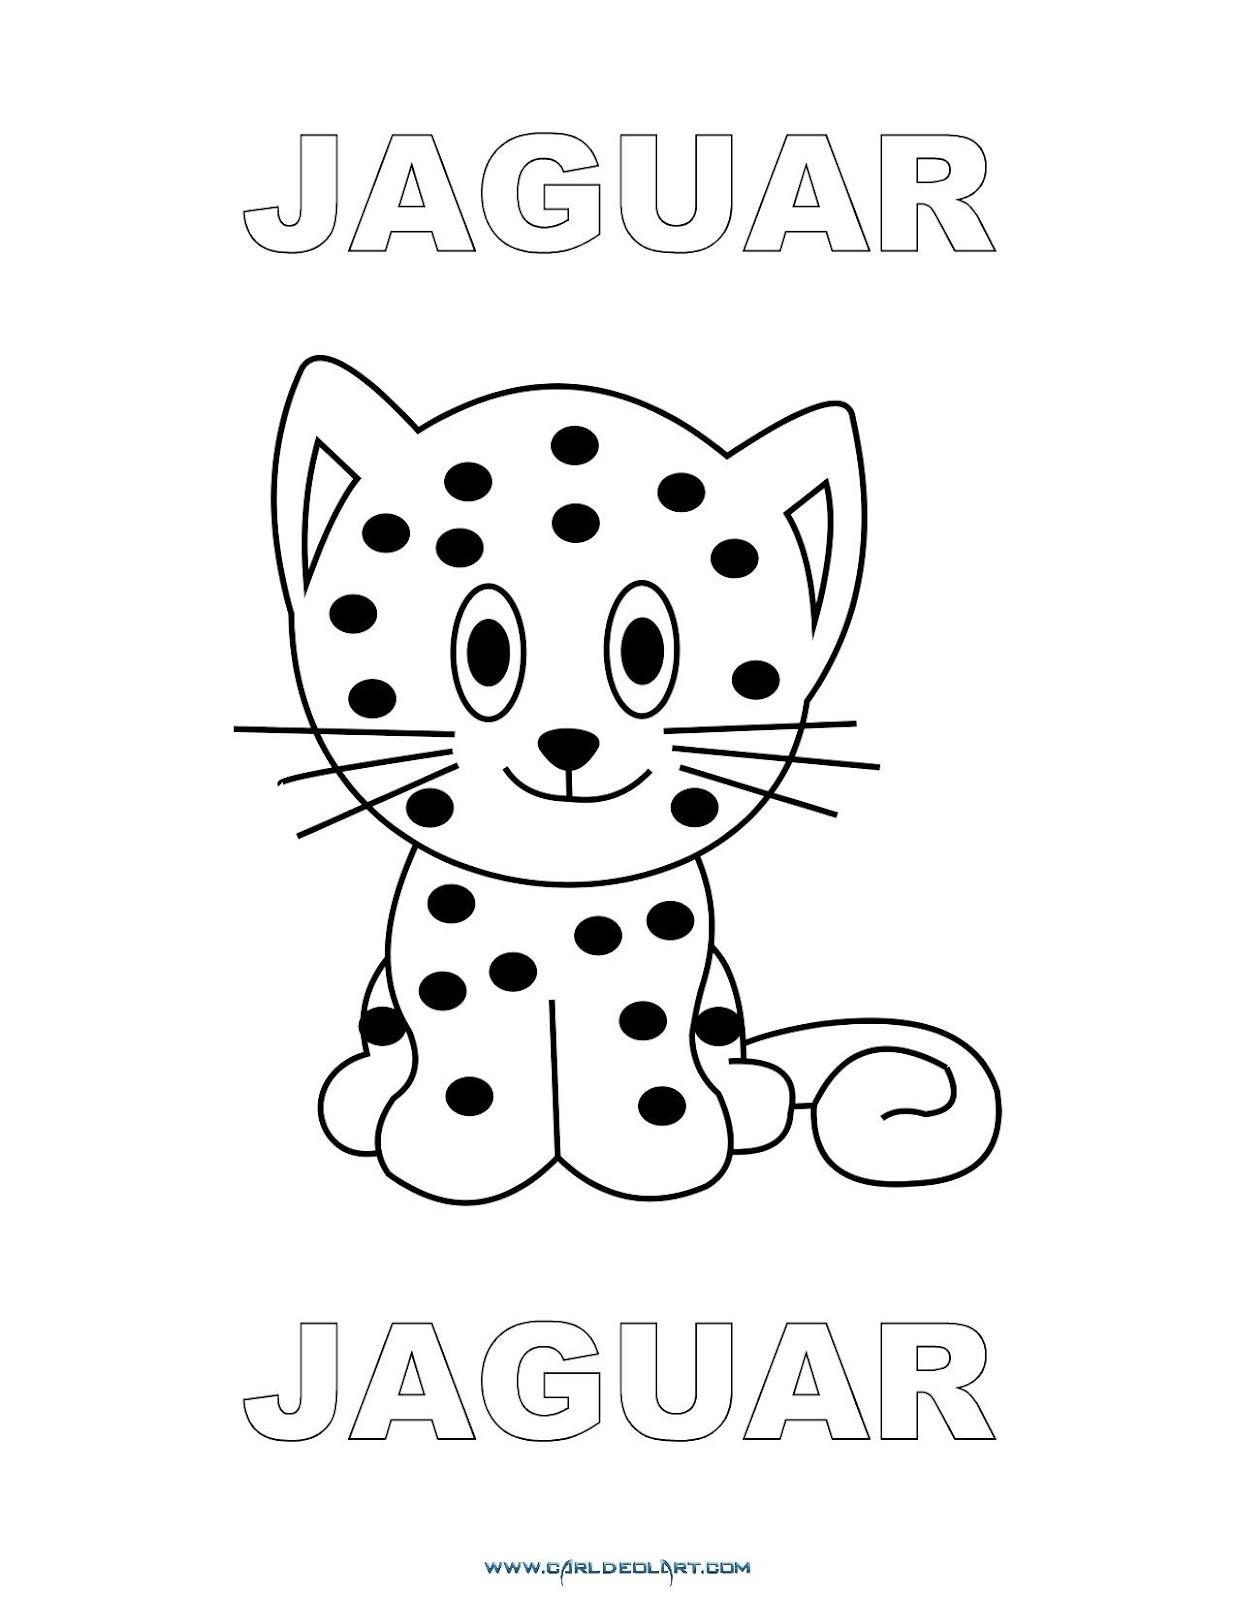 Dibujos Inglés Español Con J Jaguar Jaguar Dibujospacolorear